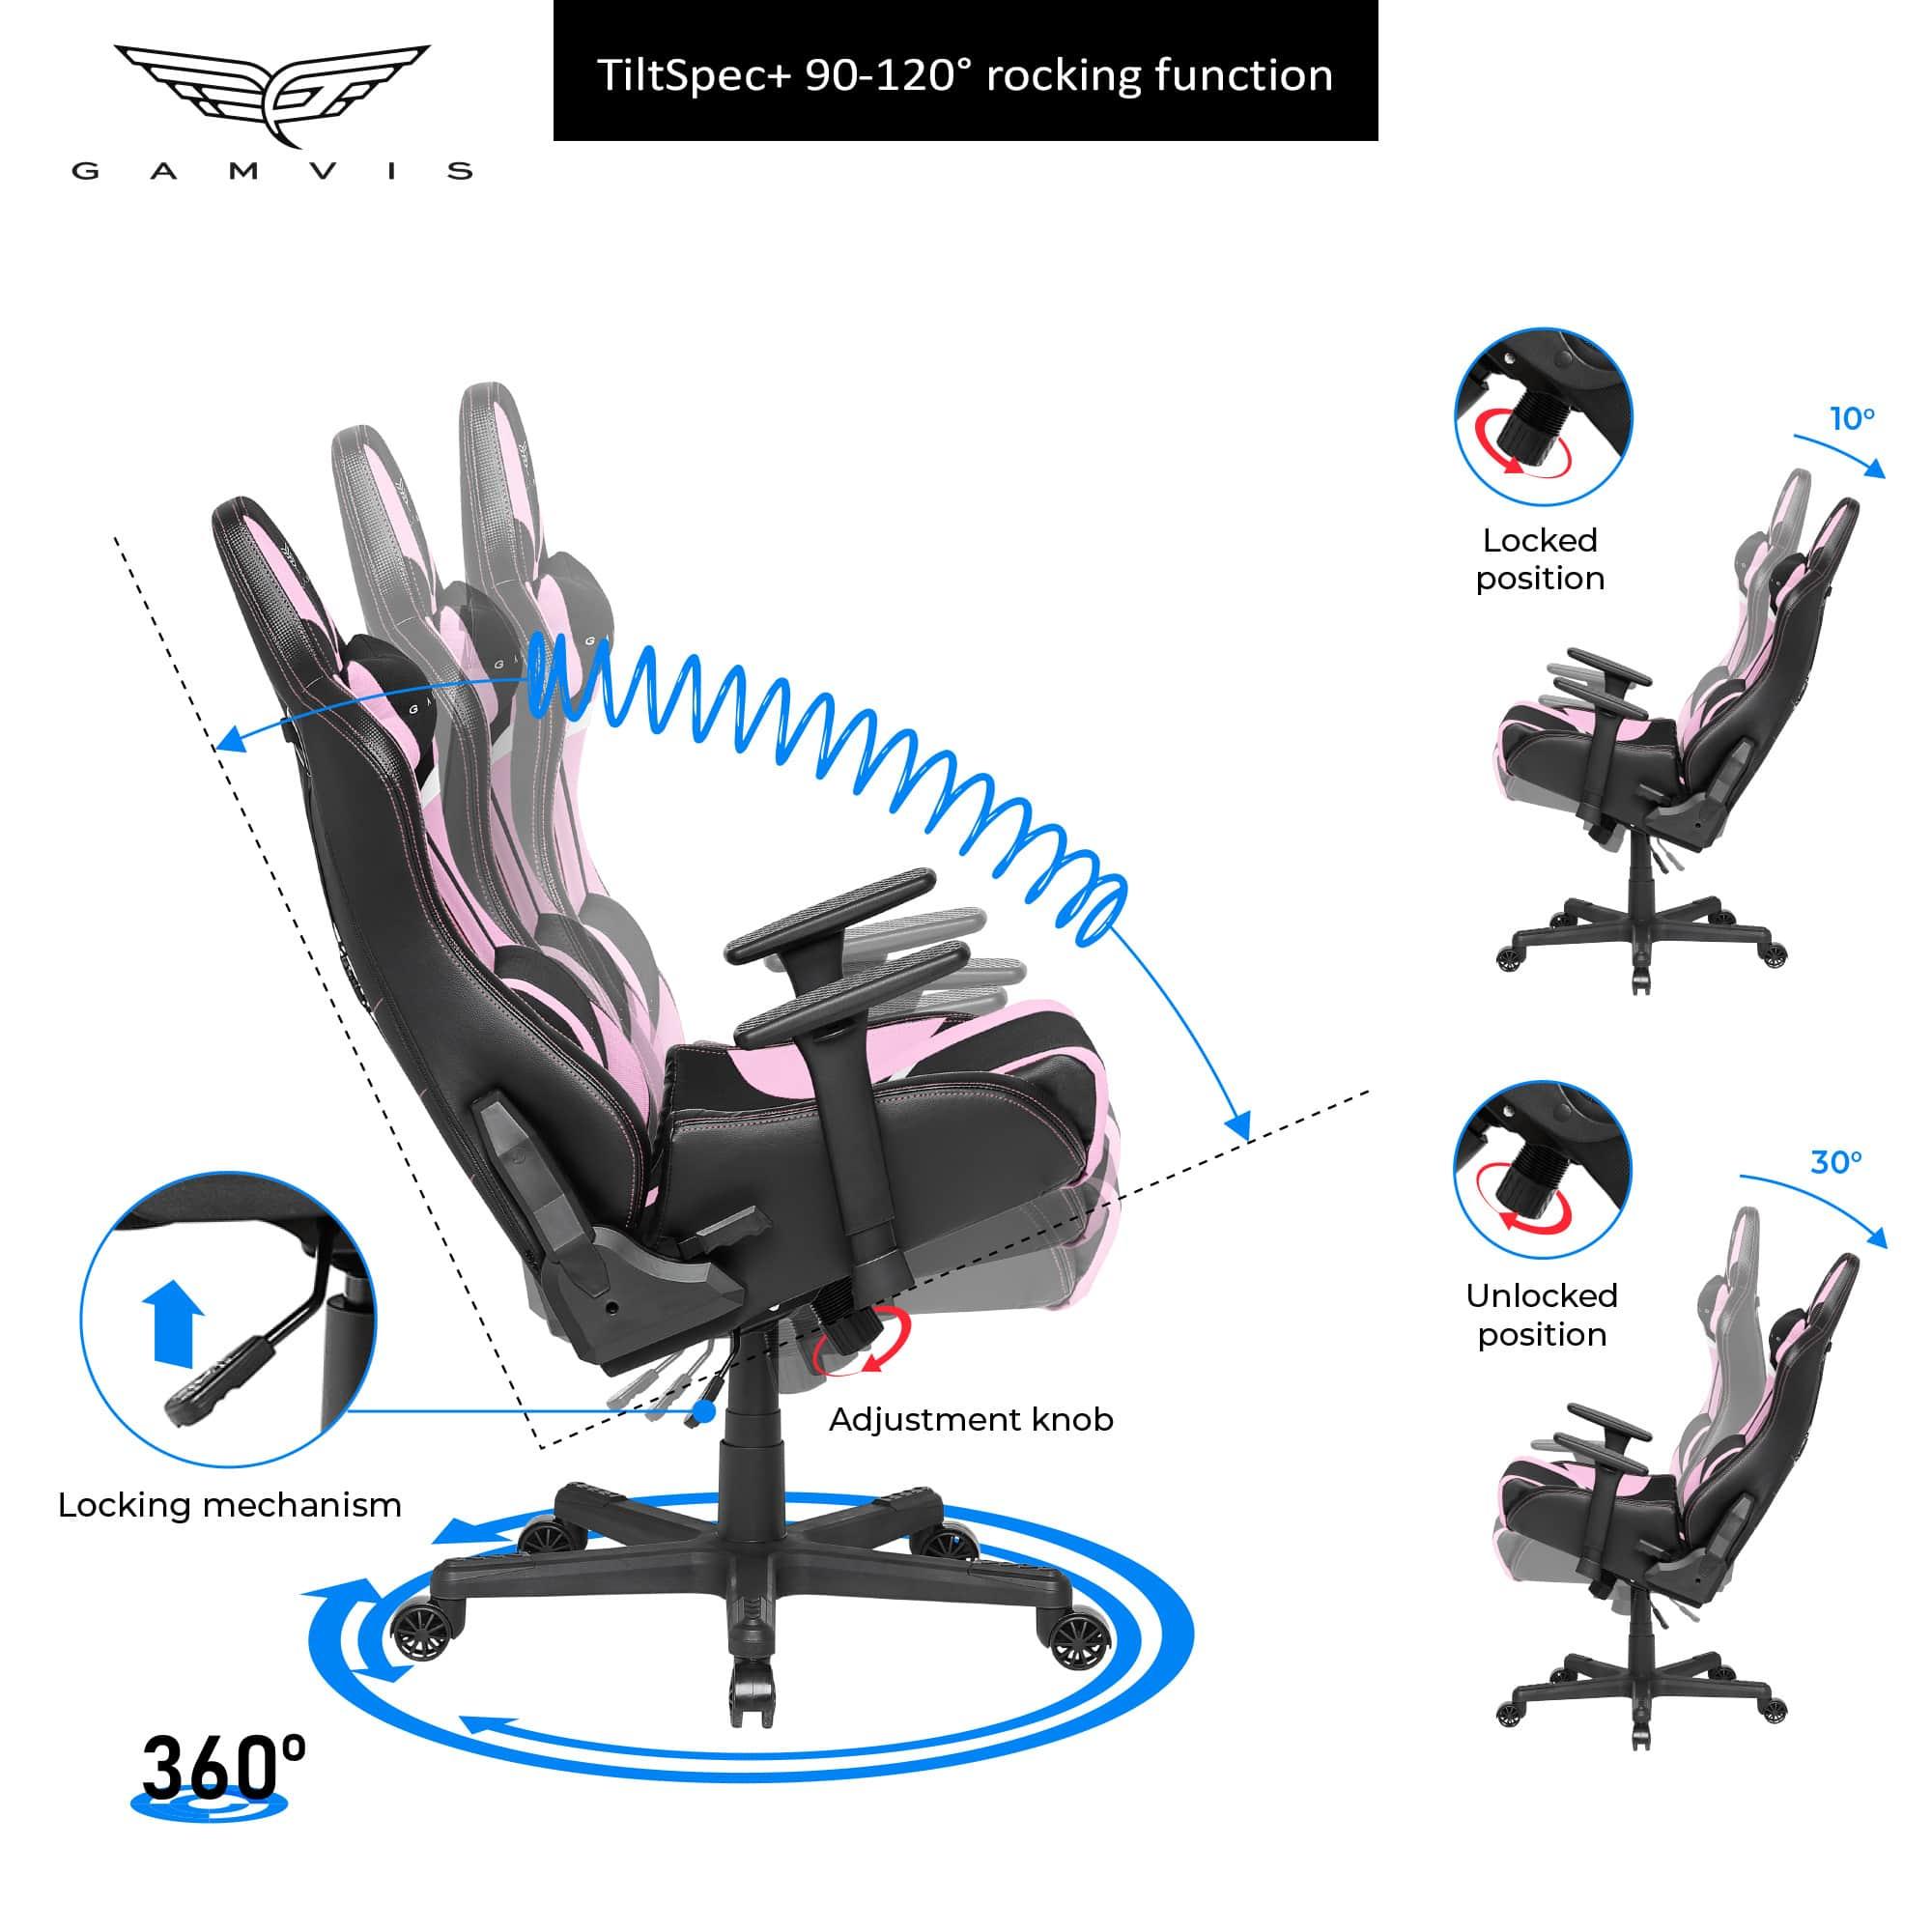 Gamvis Furioso Ladies Fabric Gaming Chair Black Pink White Gamvis Gaming Chairs